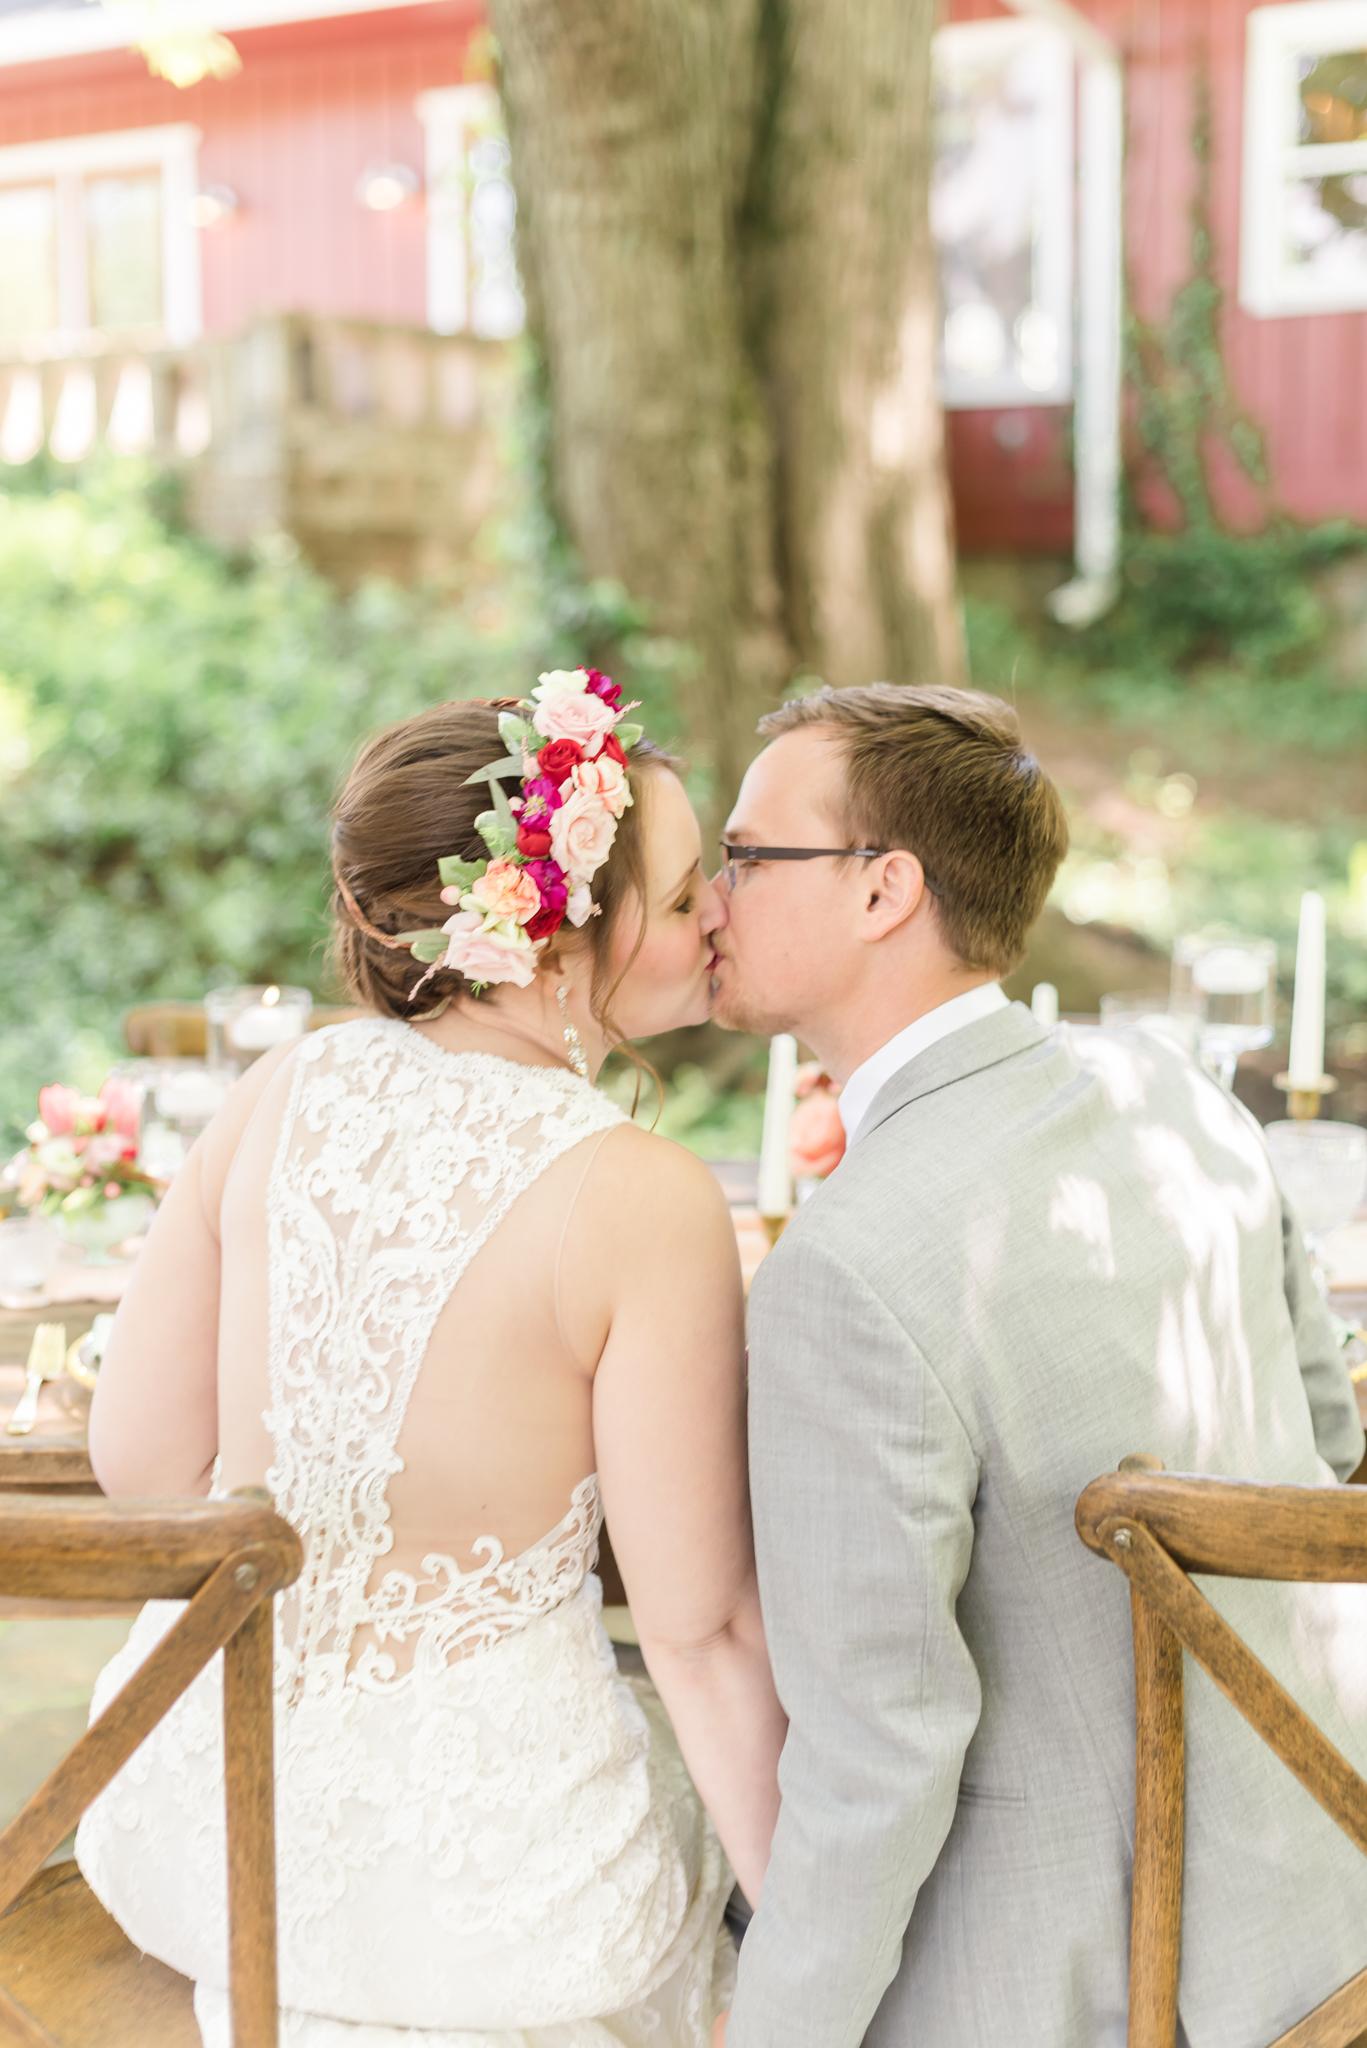 Mustard Seed Gardens Wedding Indianapolis Noblesvile Fishers Wedding Photographer-68.jpg